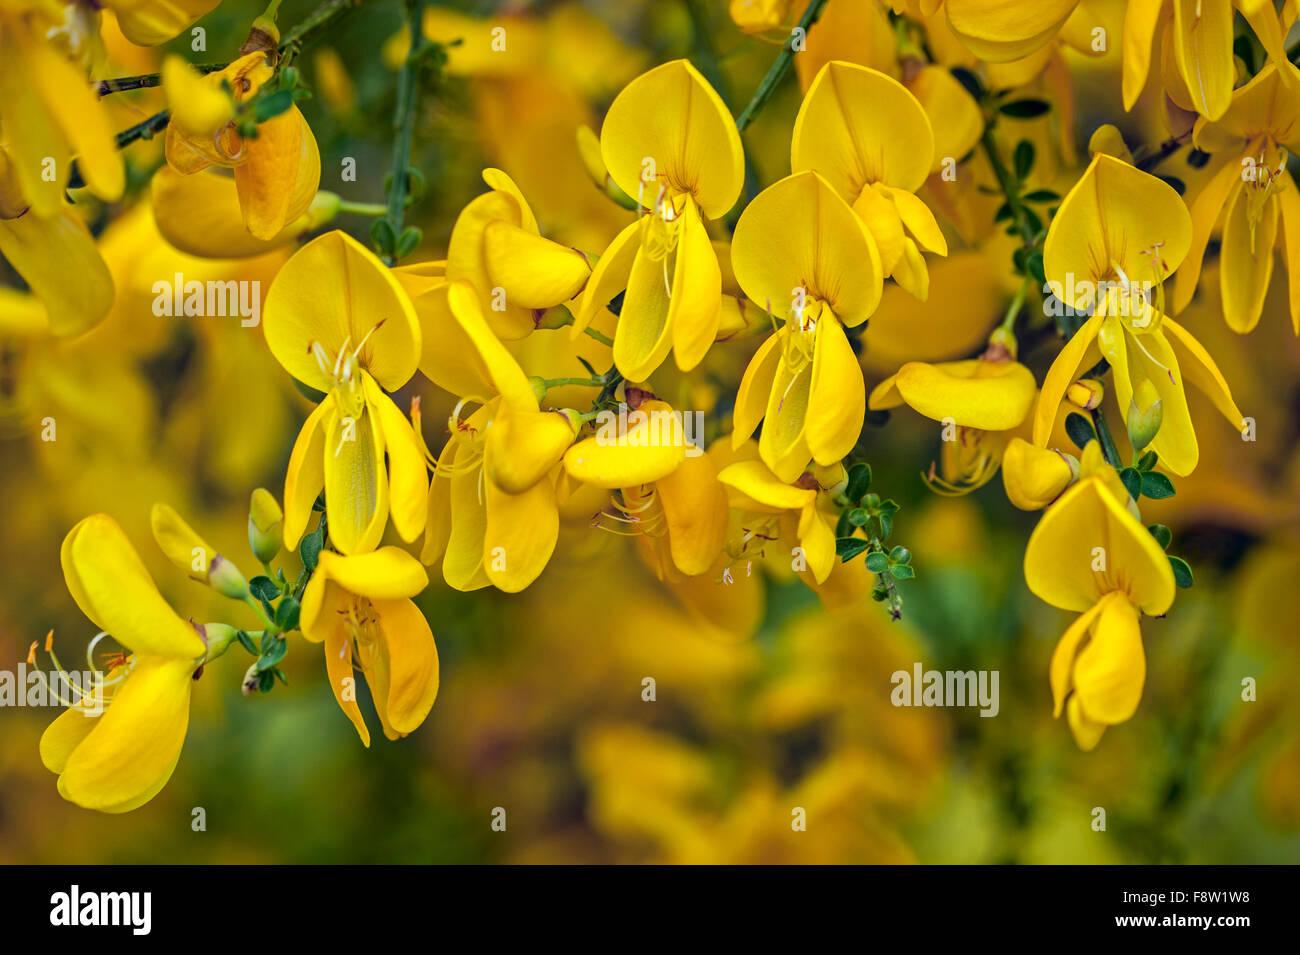 Common broom / Scotch broom / Scot's broom / English broom (Cytisus scoparius / Sarothamnus scoparius) in flower - Stock Image